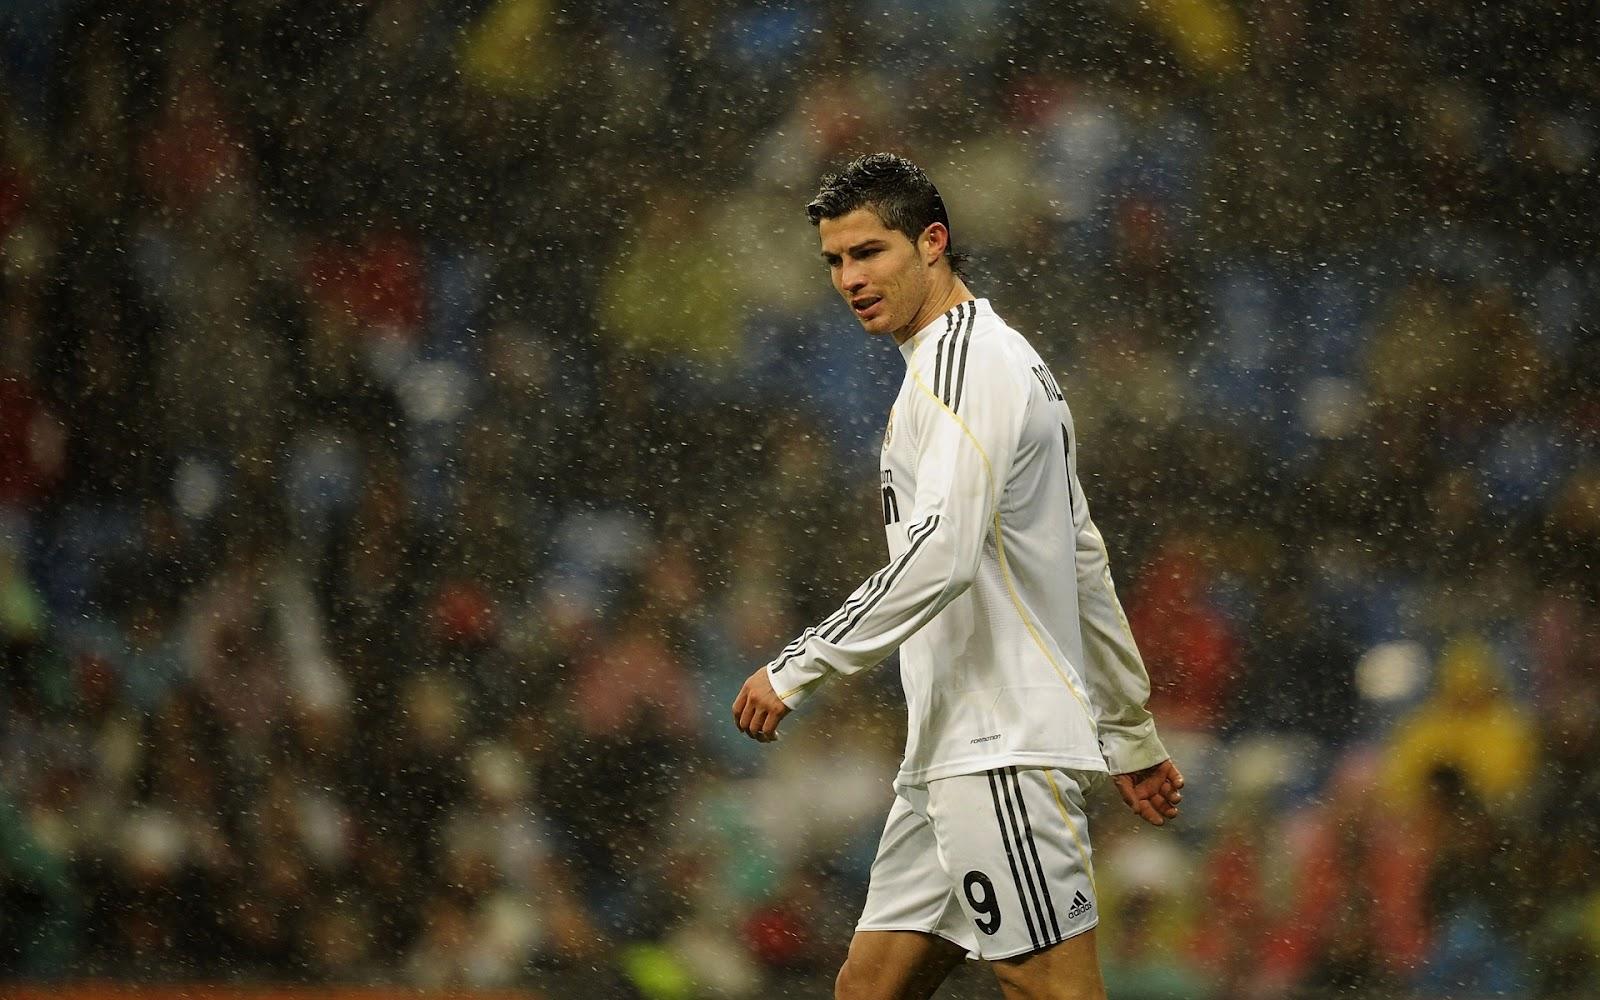 http://2.bp.blogspot.com/-IK7RiNAsgNA/TzNEuqTT6xI/AAAAAAAAAwc/ZzcQvMKYBaE/s1600/cristiano+Ronaldo+in+rain.jpg